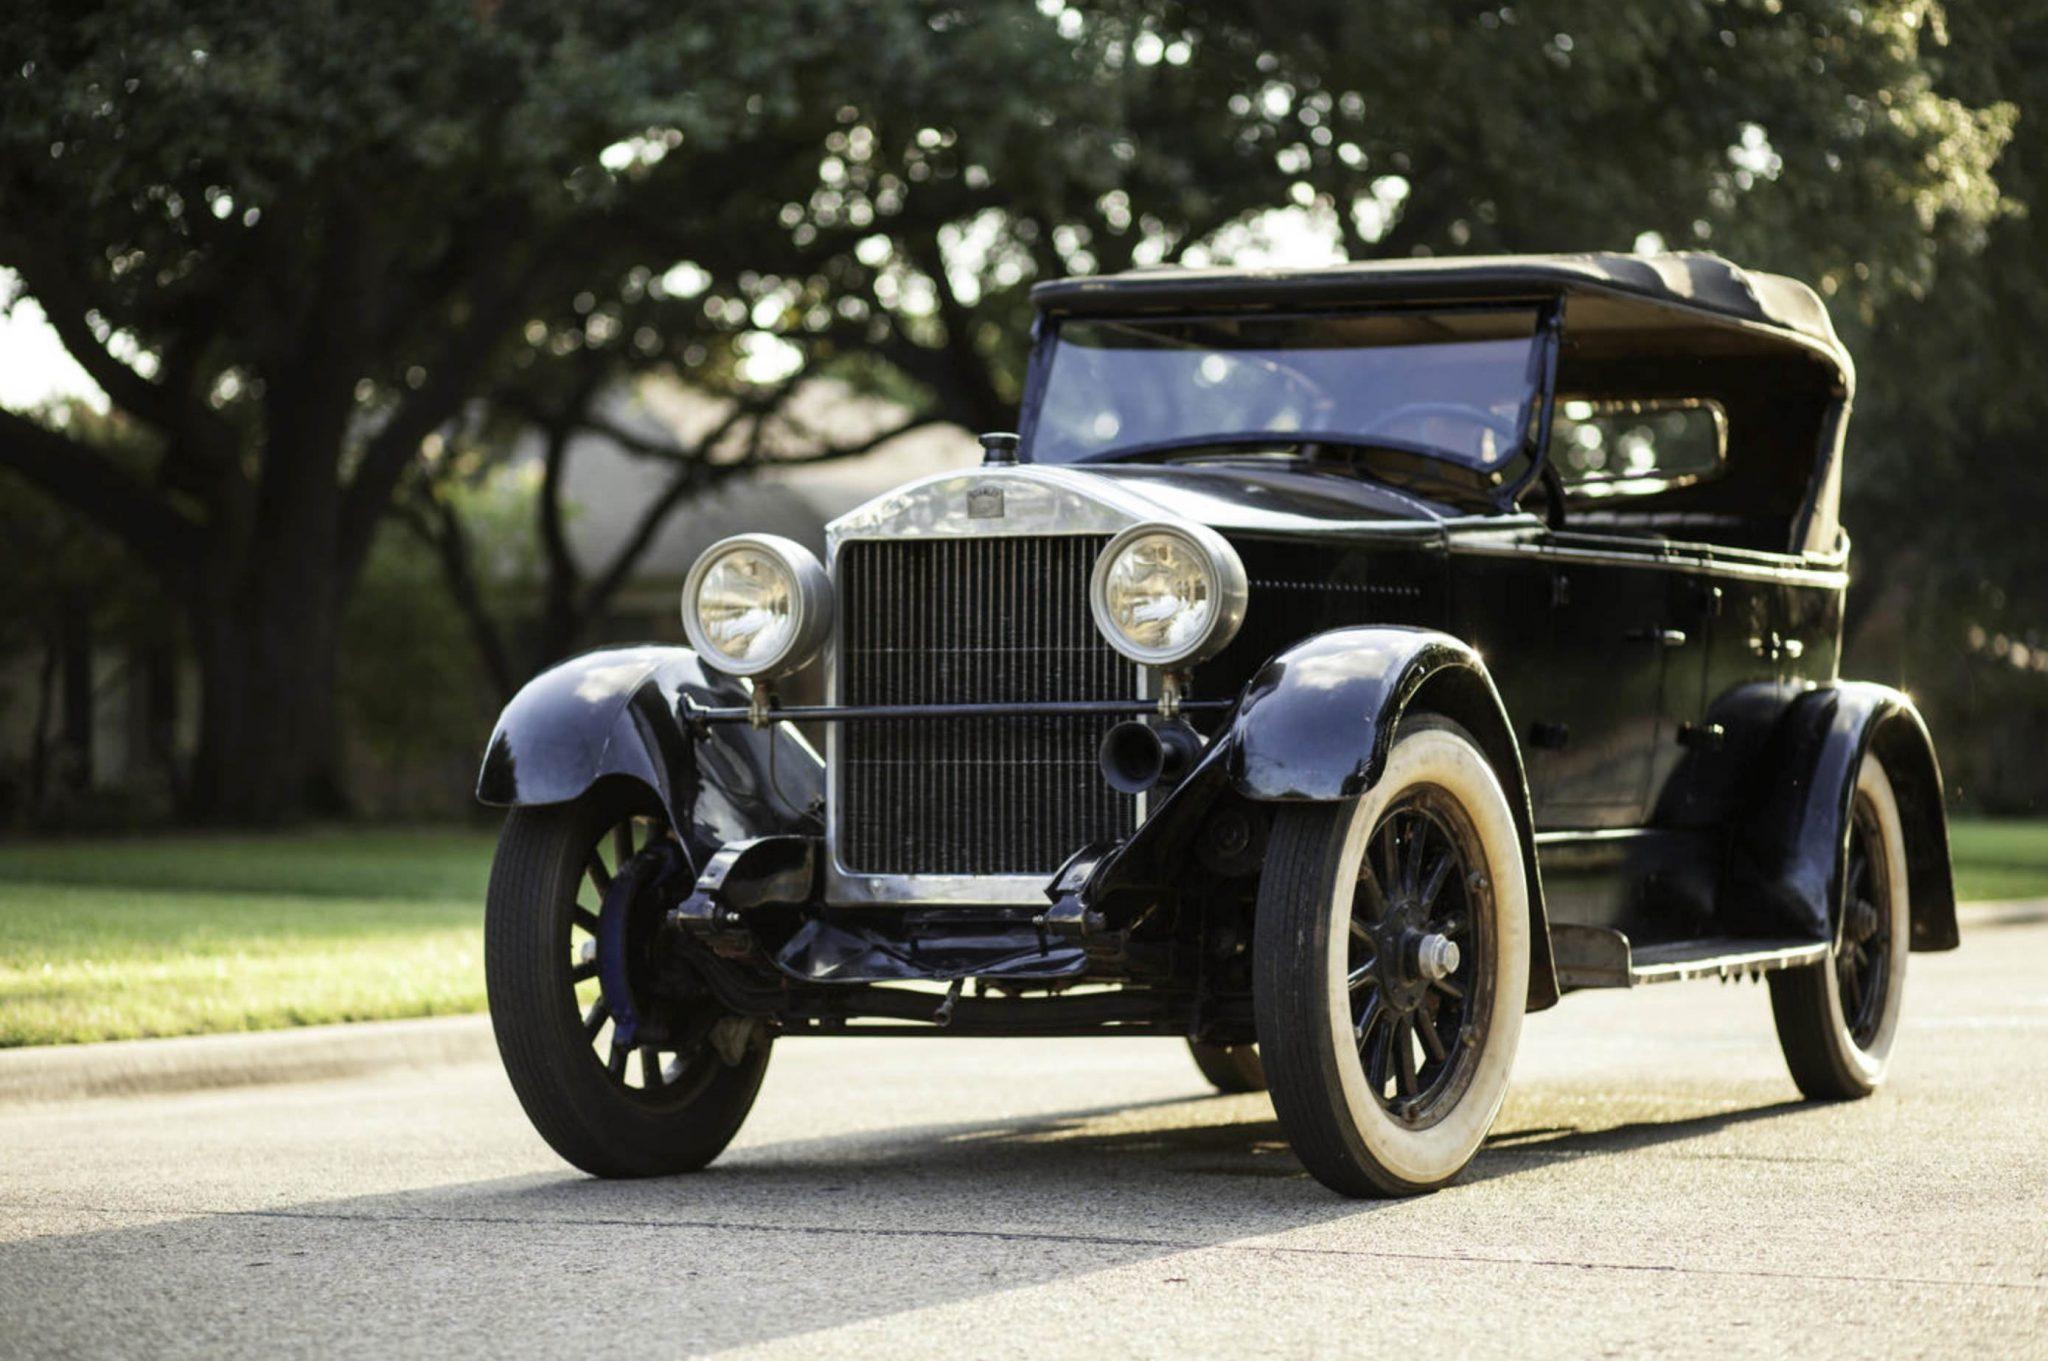 Stanley Steamer Car >> 1925 Stanley Steamer